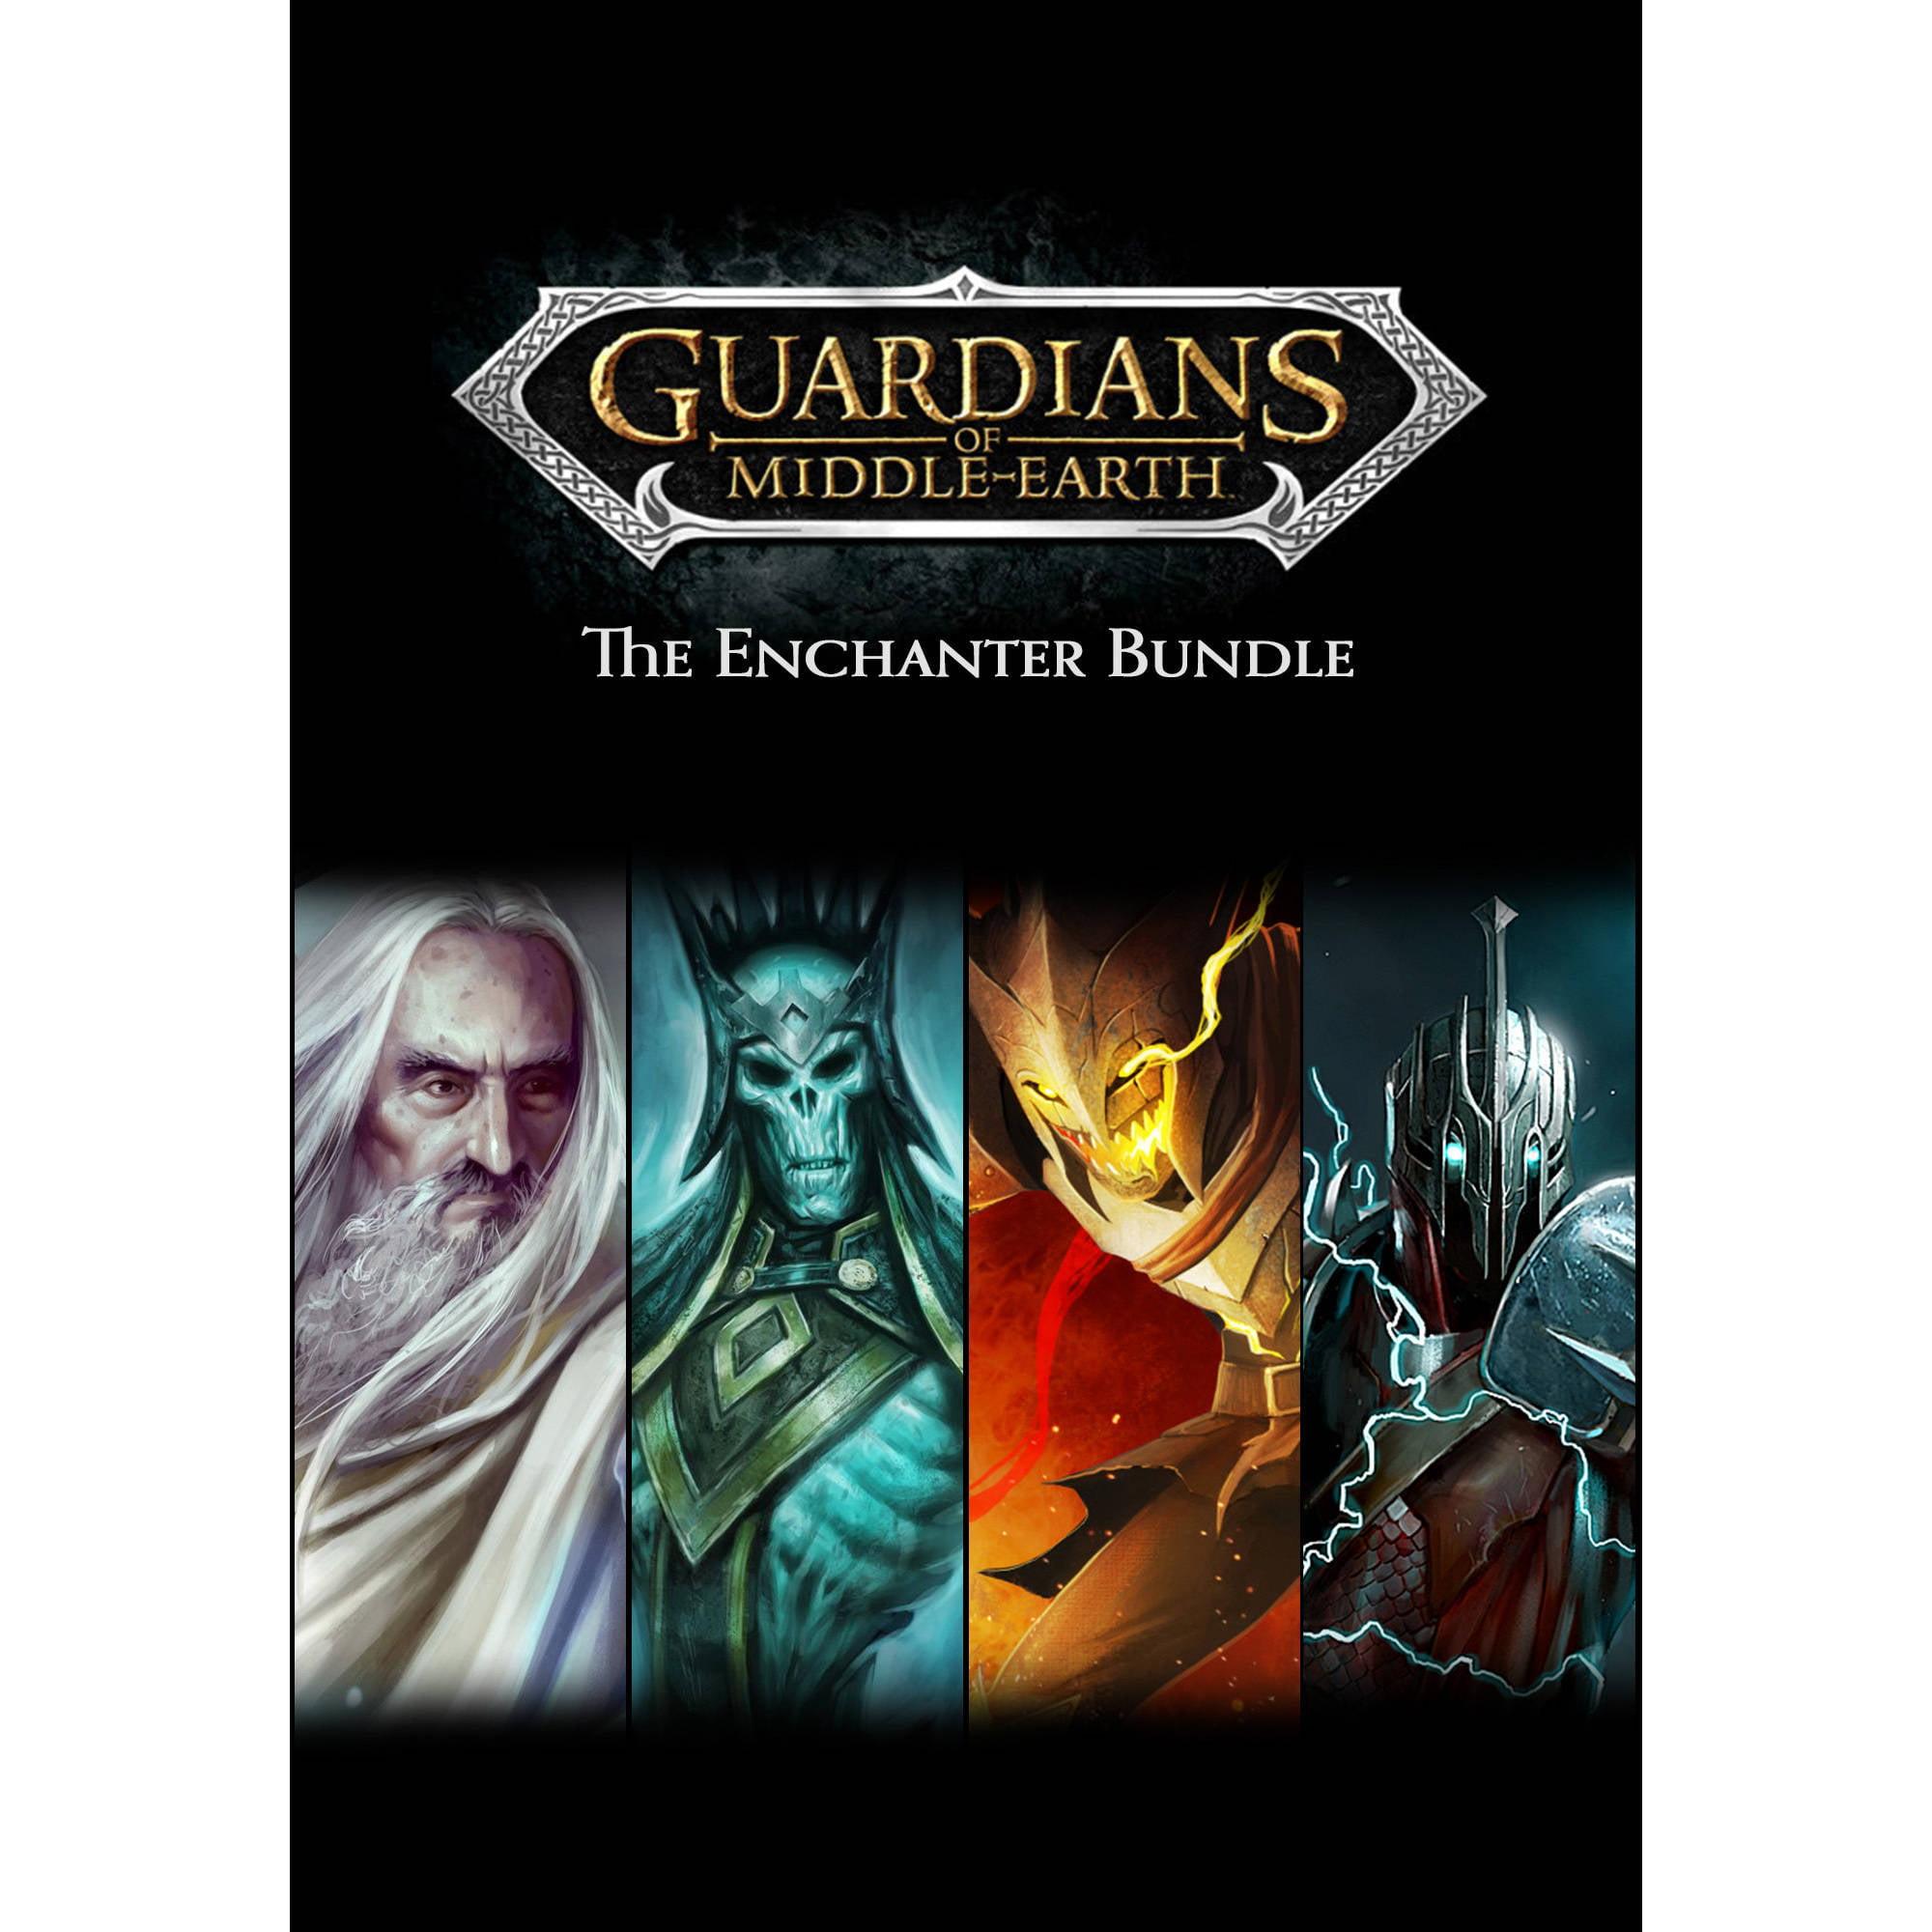 Guardians of Middle-Earth: The Enchanter Bundle (PC) (Digital Download)